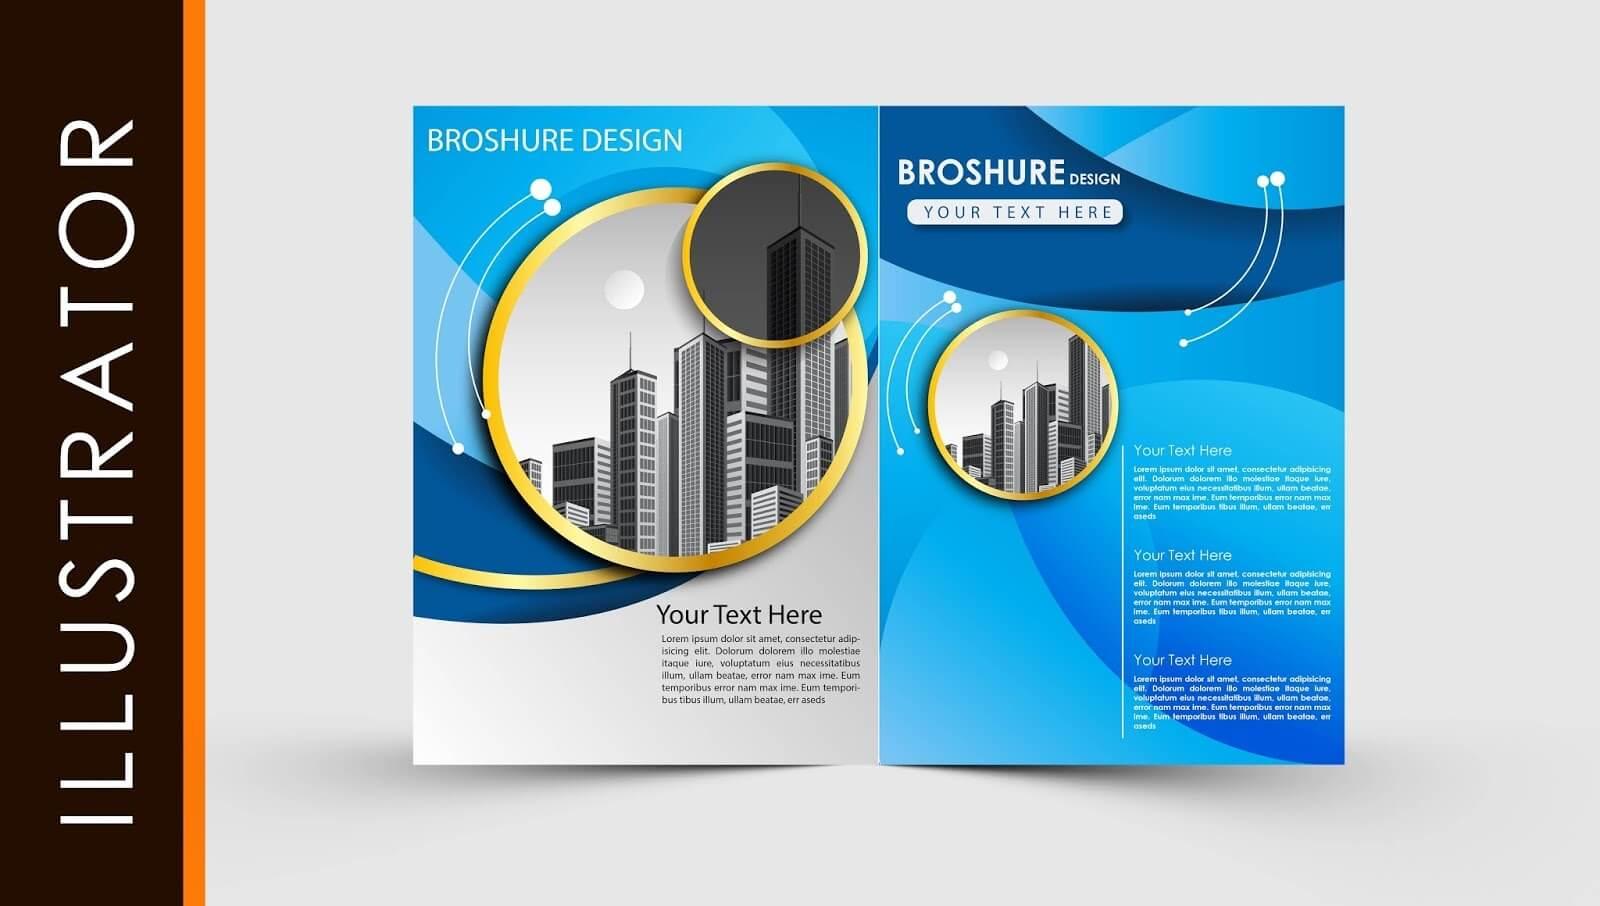 Free Download Adobe Illustrator Template Brochure Two Fold Inside Illustrator Brochure Templates Free Download